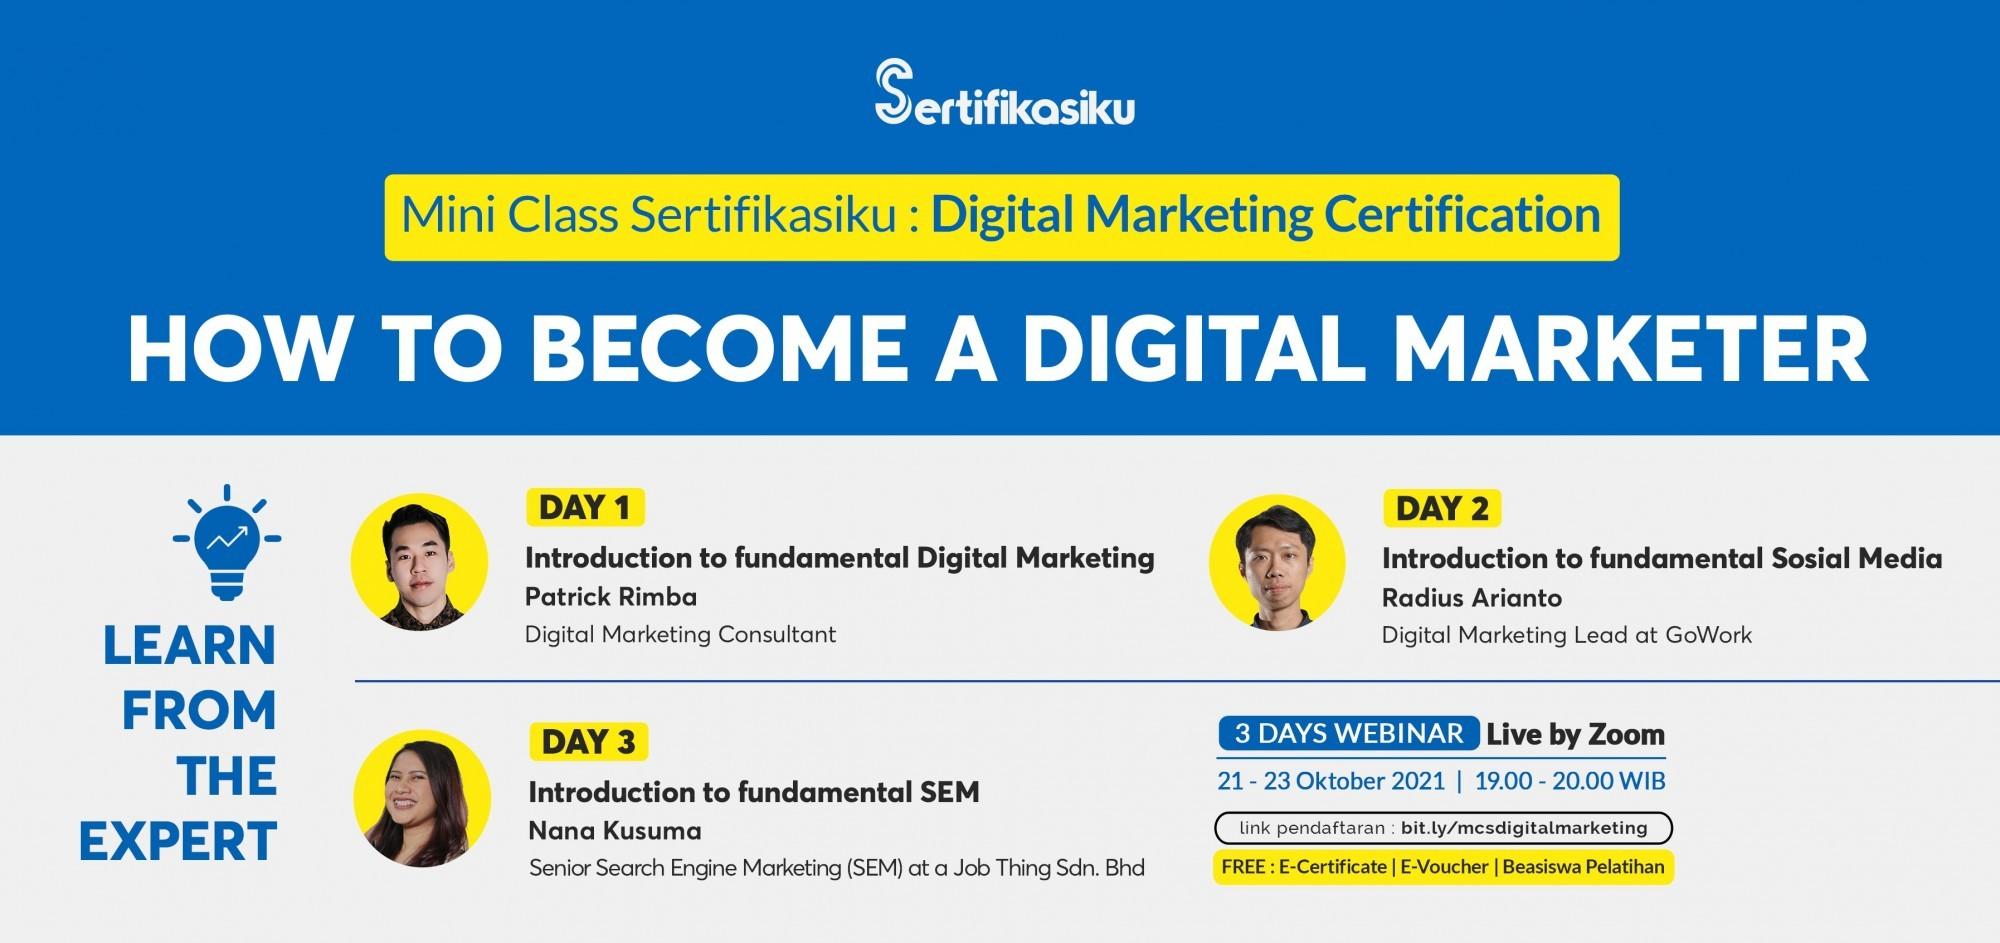 Mini Class Sertifikasiku : How To Become A Digital Marketer